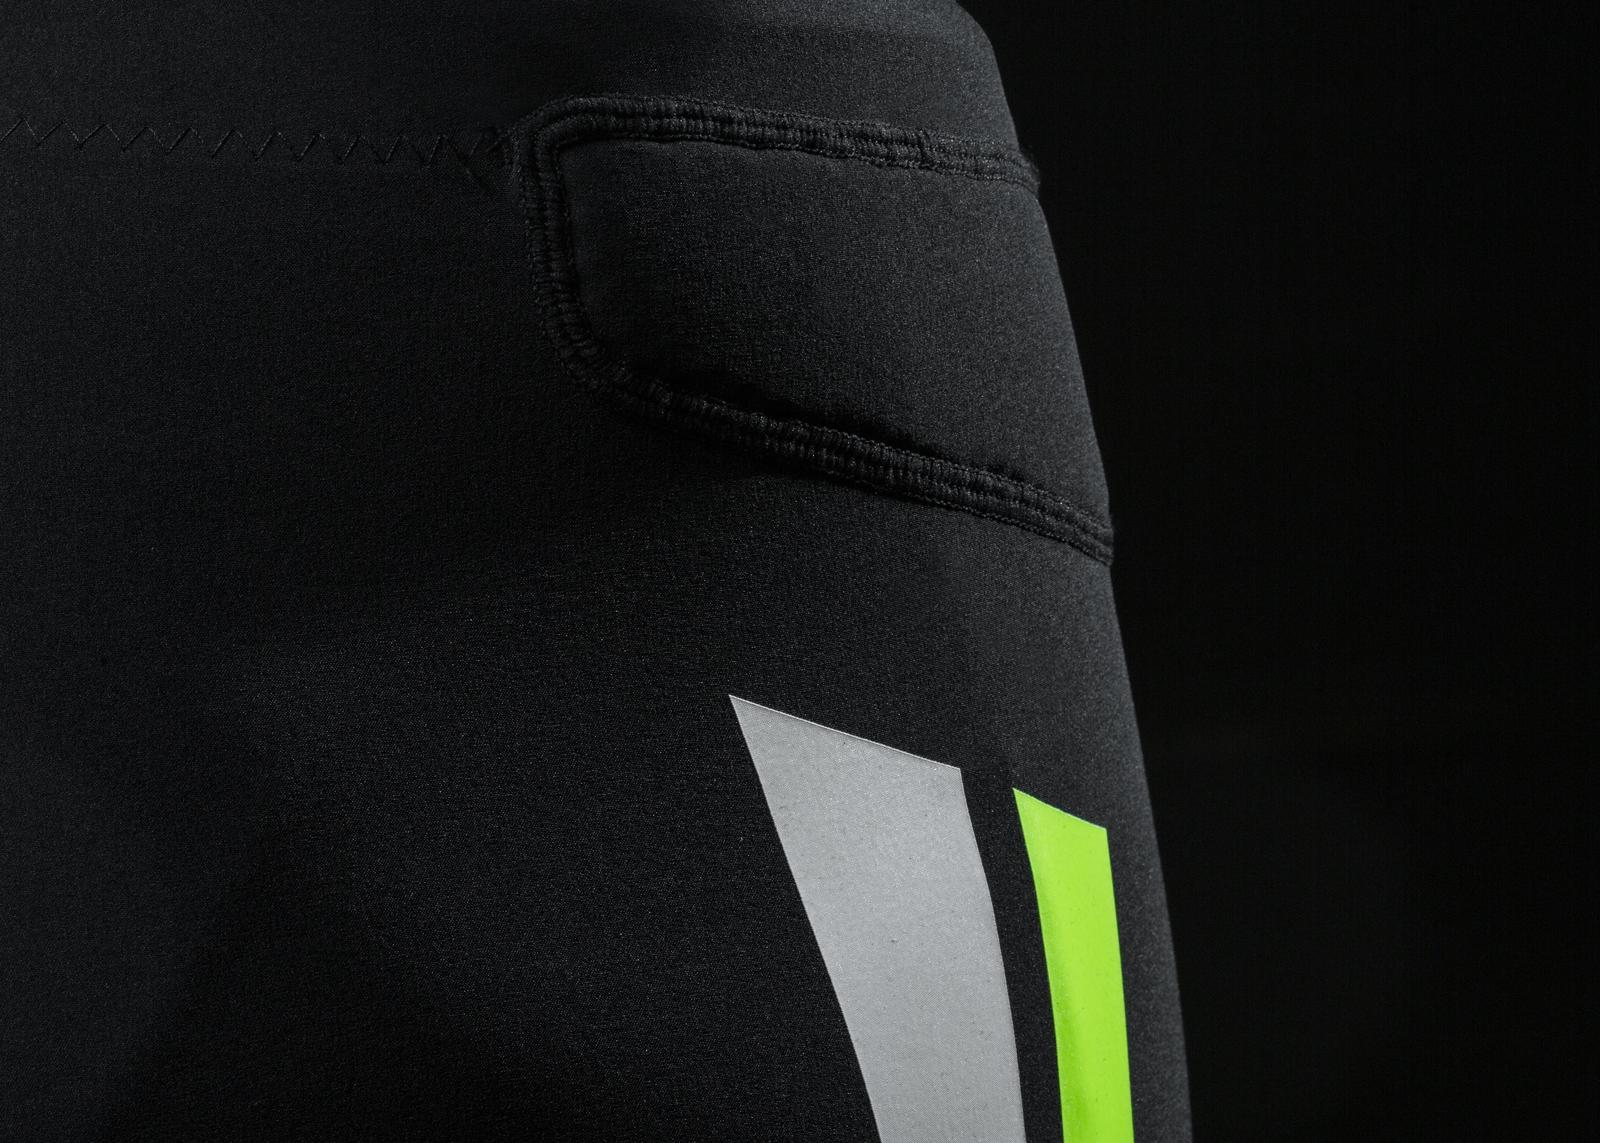 vapor speed pant detail 2 rectangle 1600